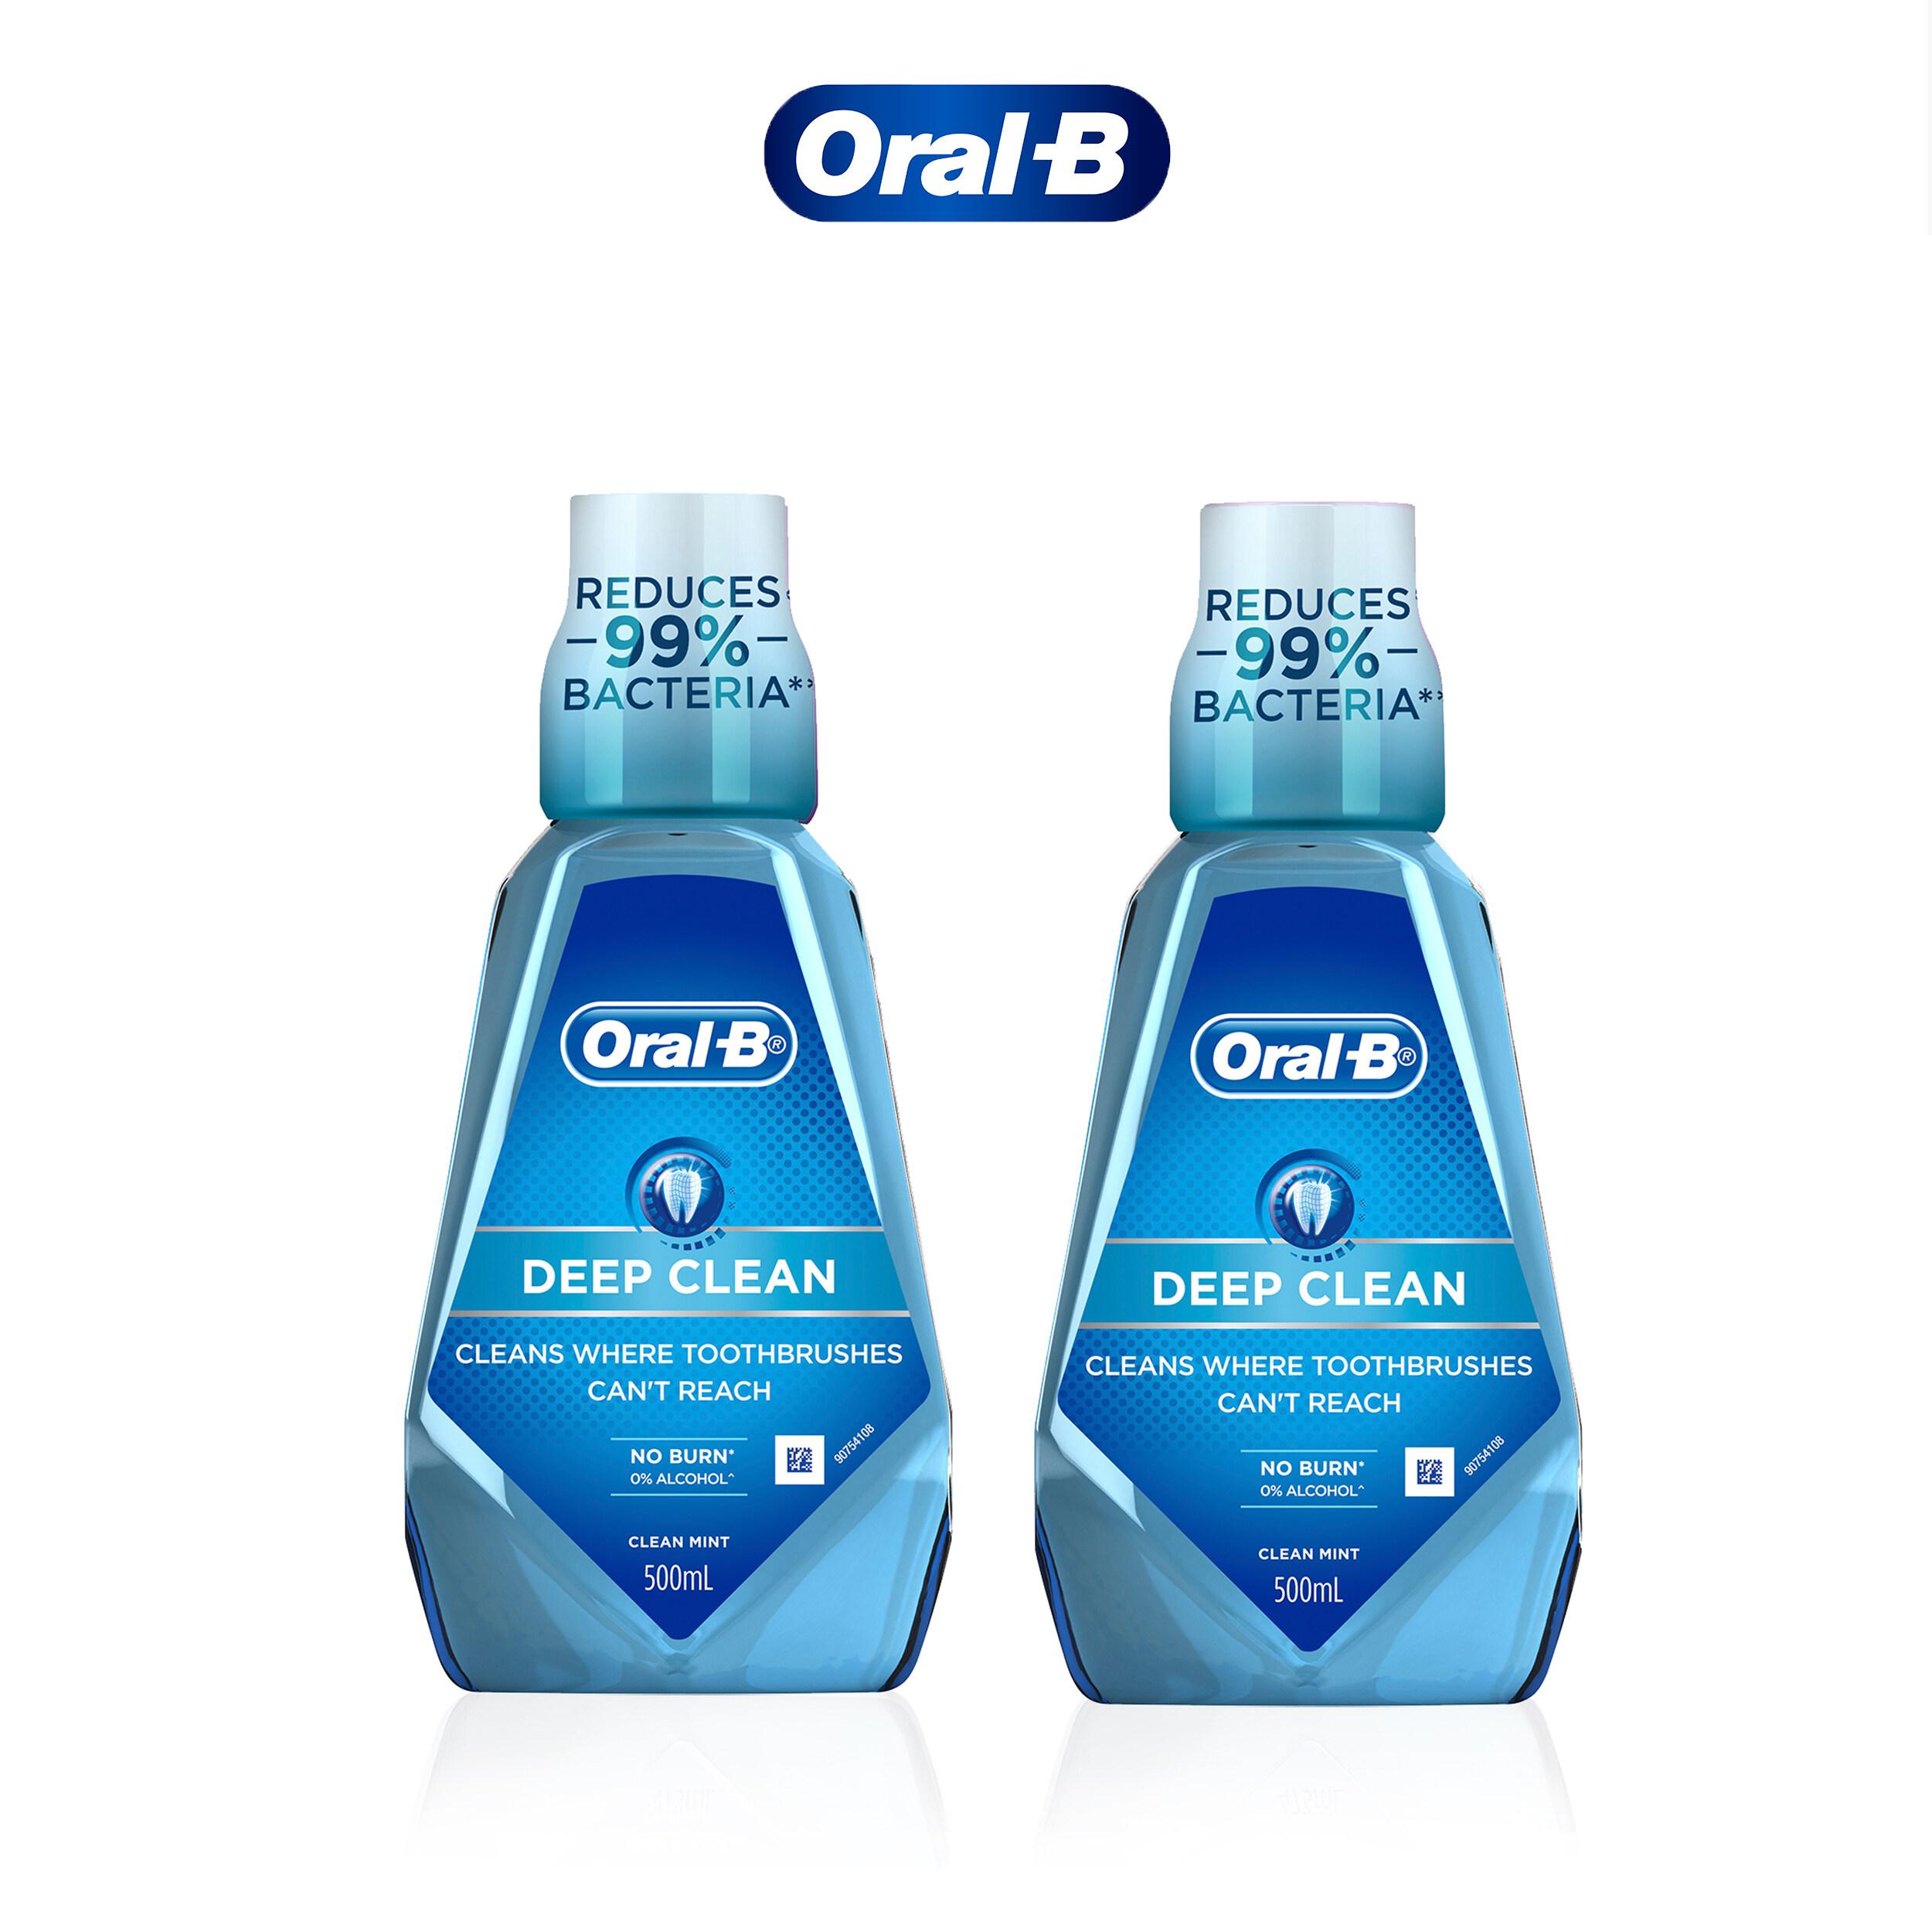 Oral-B Deepclean Mouthwash Bundle Pack (500ml x 2)